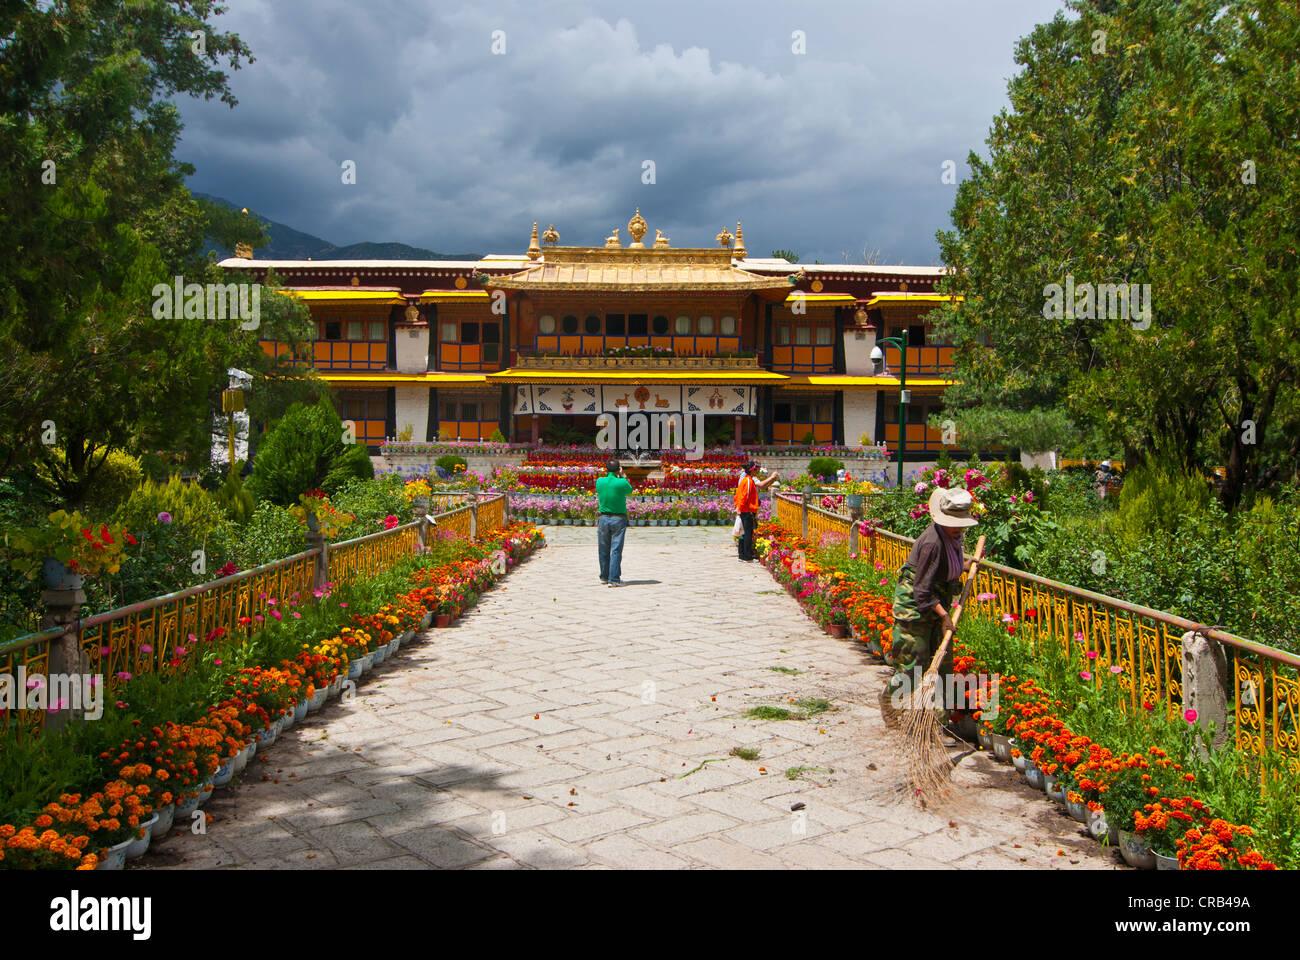 Norbulingka Summer Palace, UNESCO World Heritage Site, Lhasa, Tibet, Asia - Stock Image